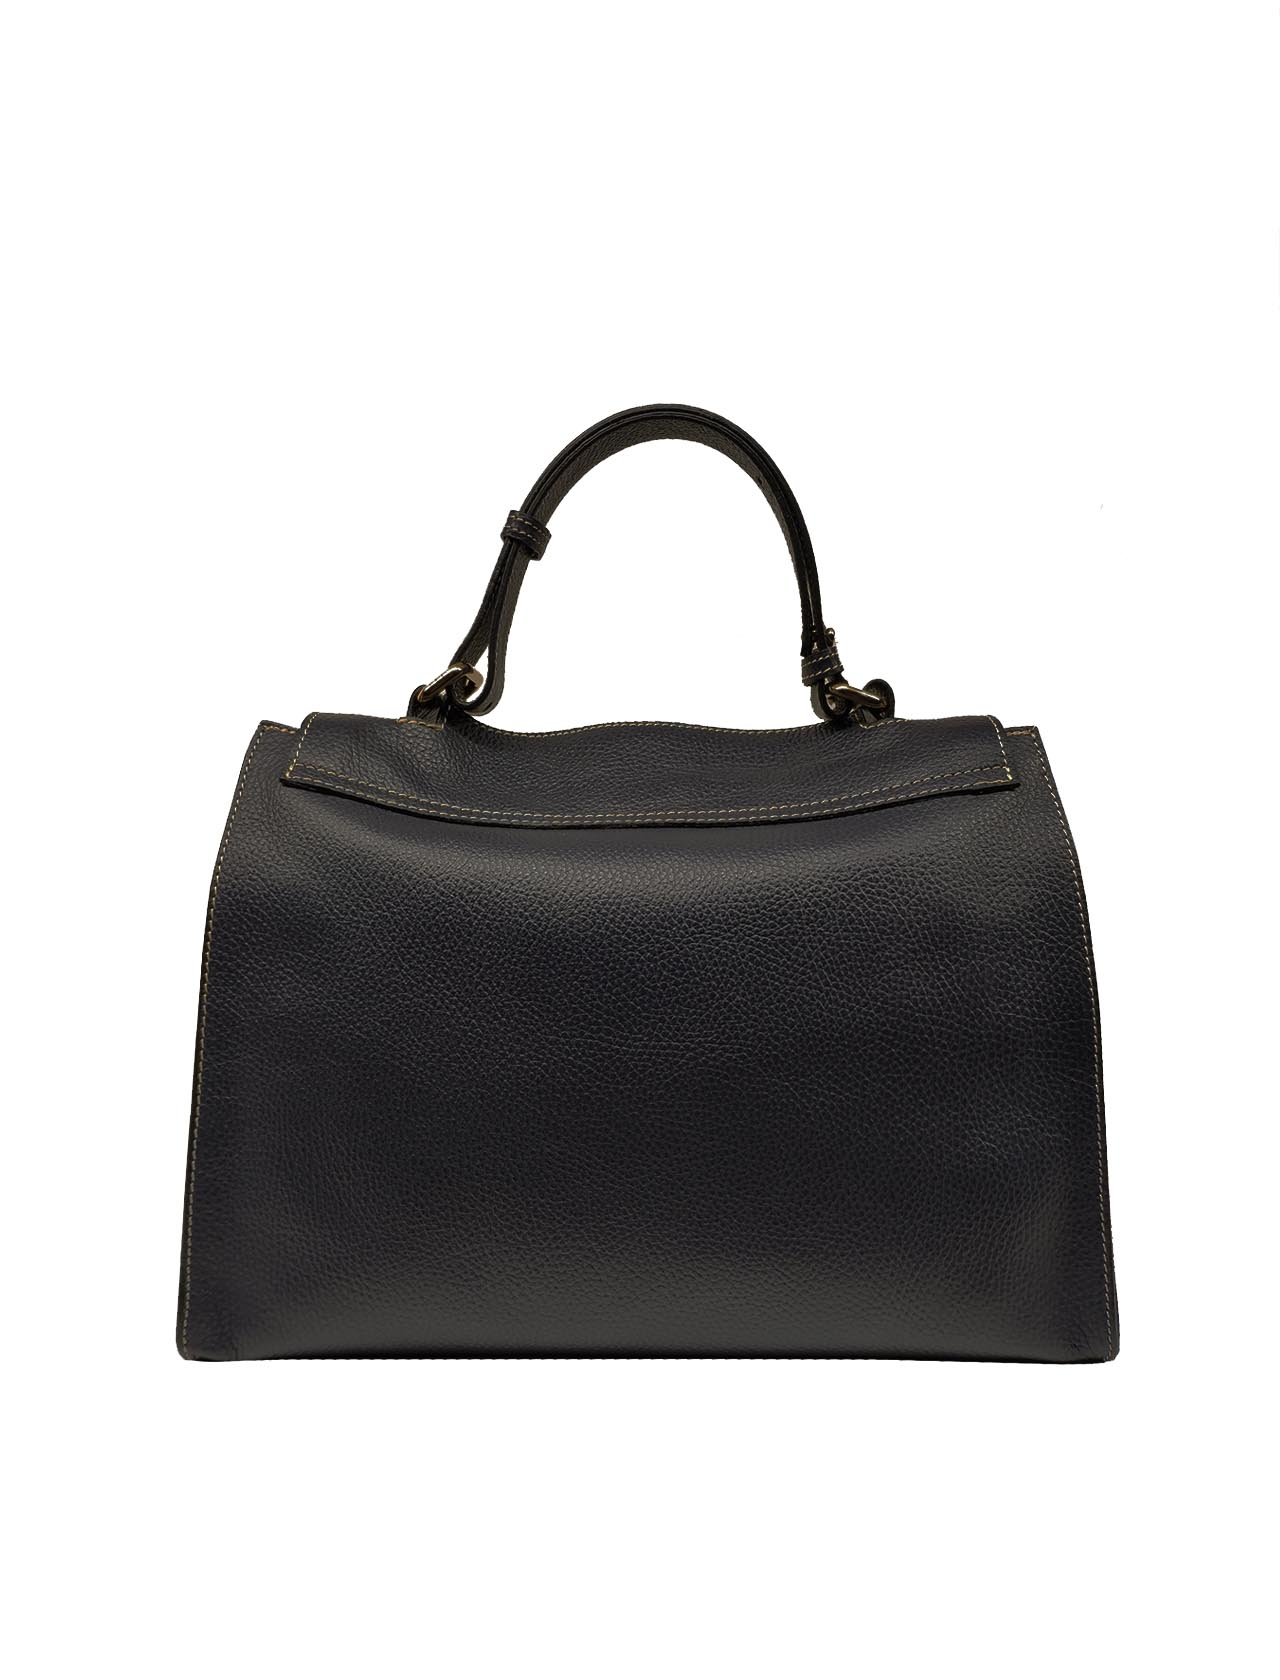 Shoulder Bag Woman Kate Koll | Bags and backpacks | 374BLU